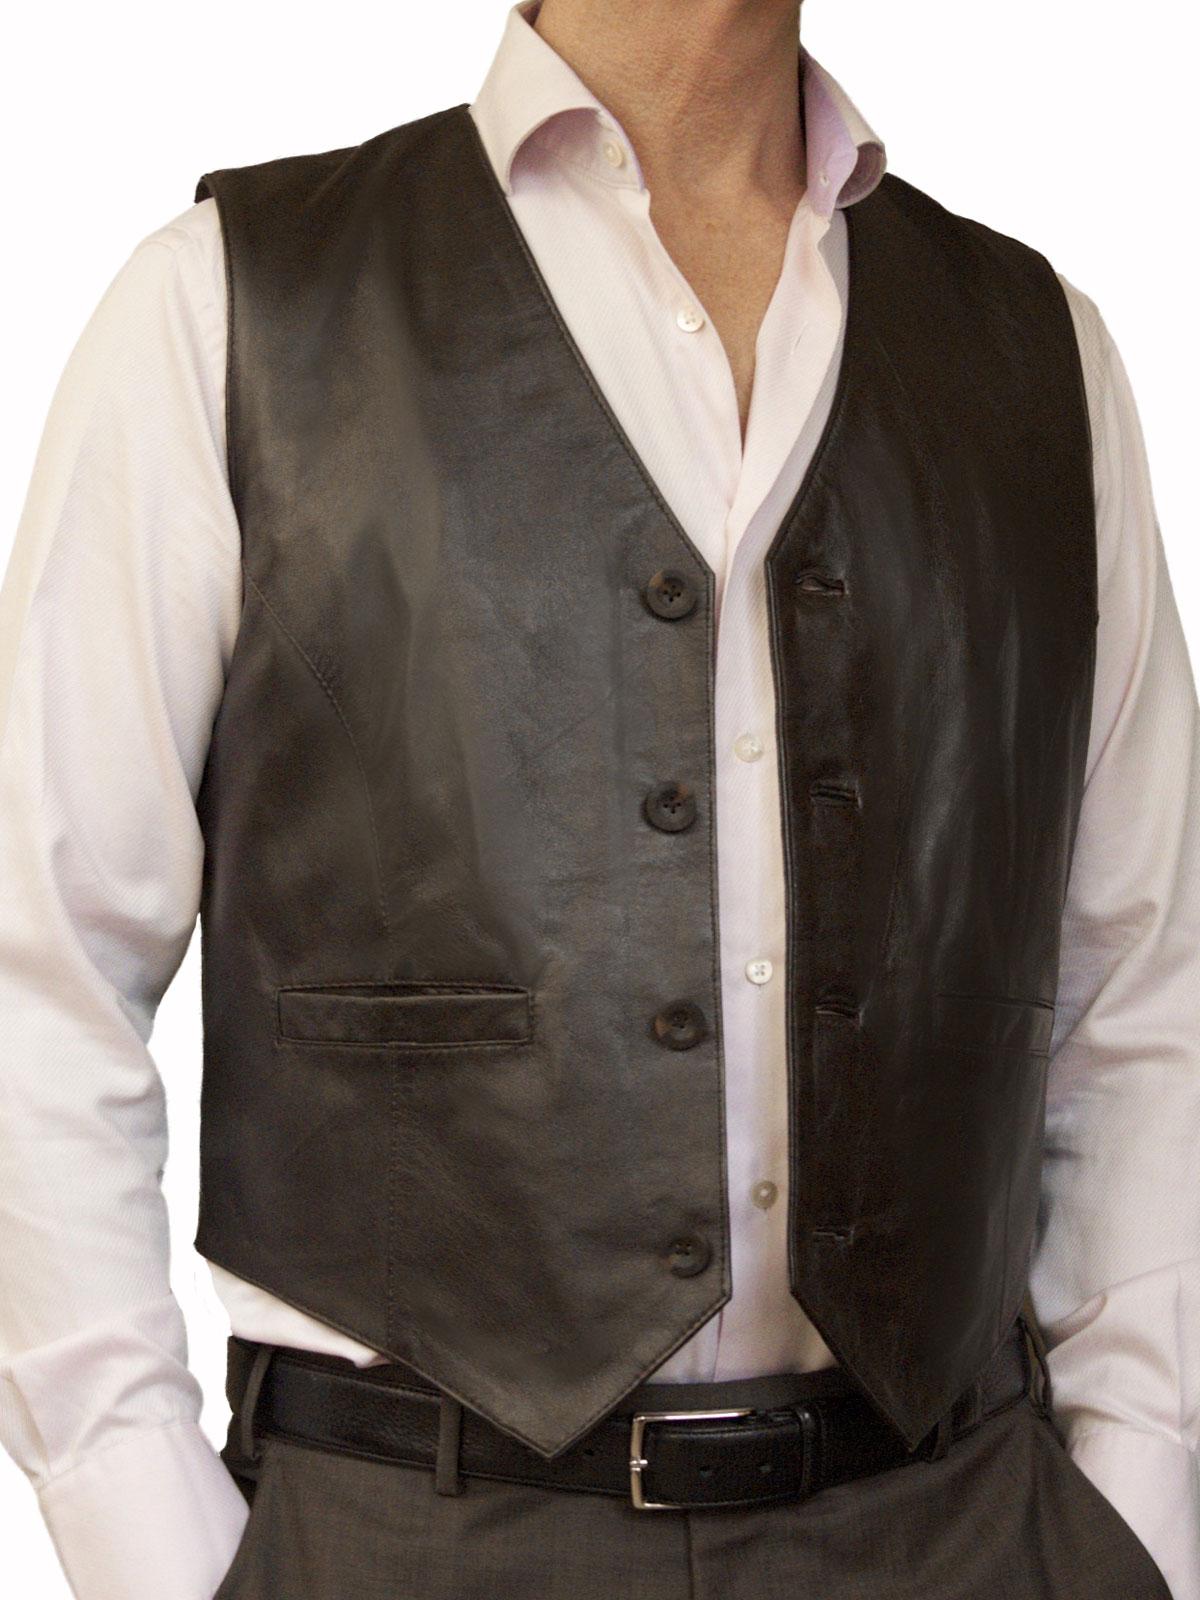 Luxury Dress Shirts For Men